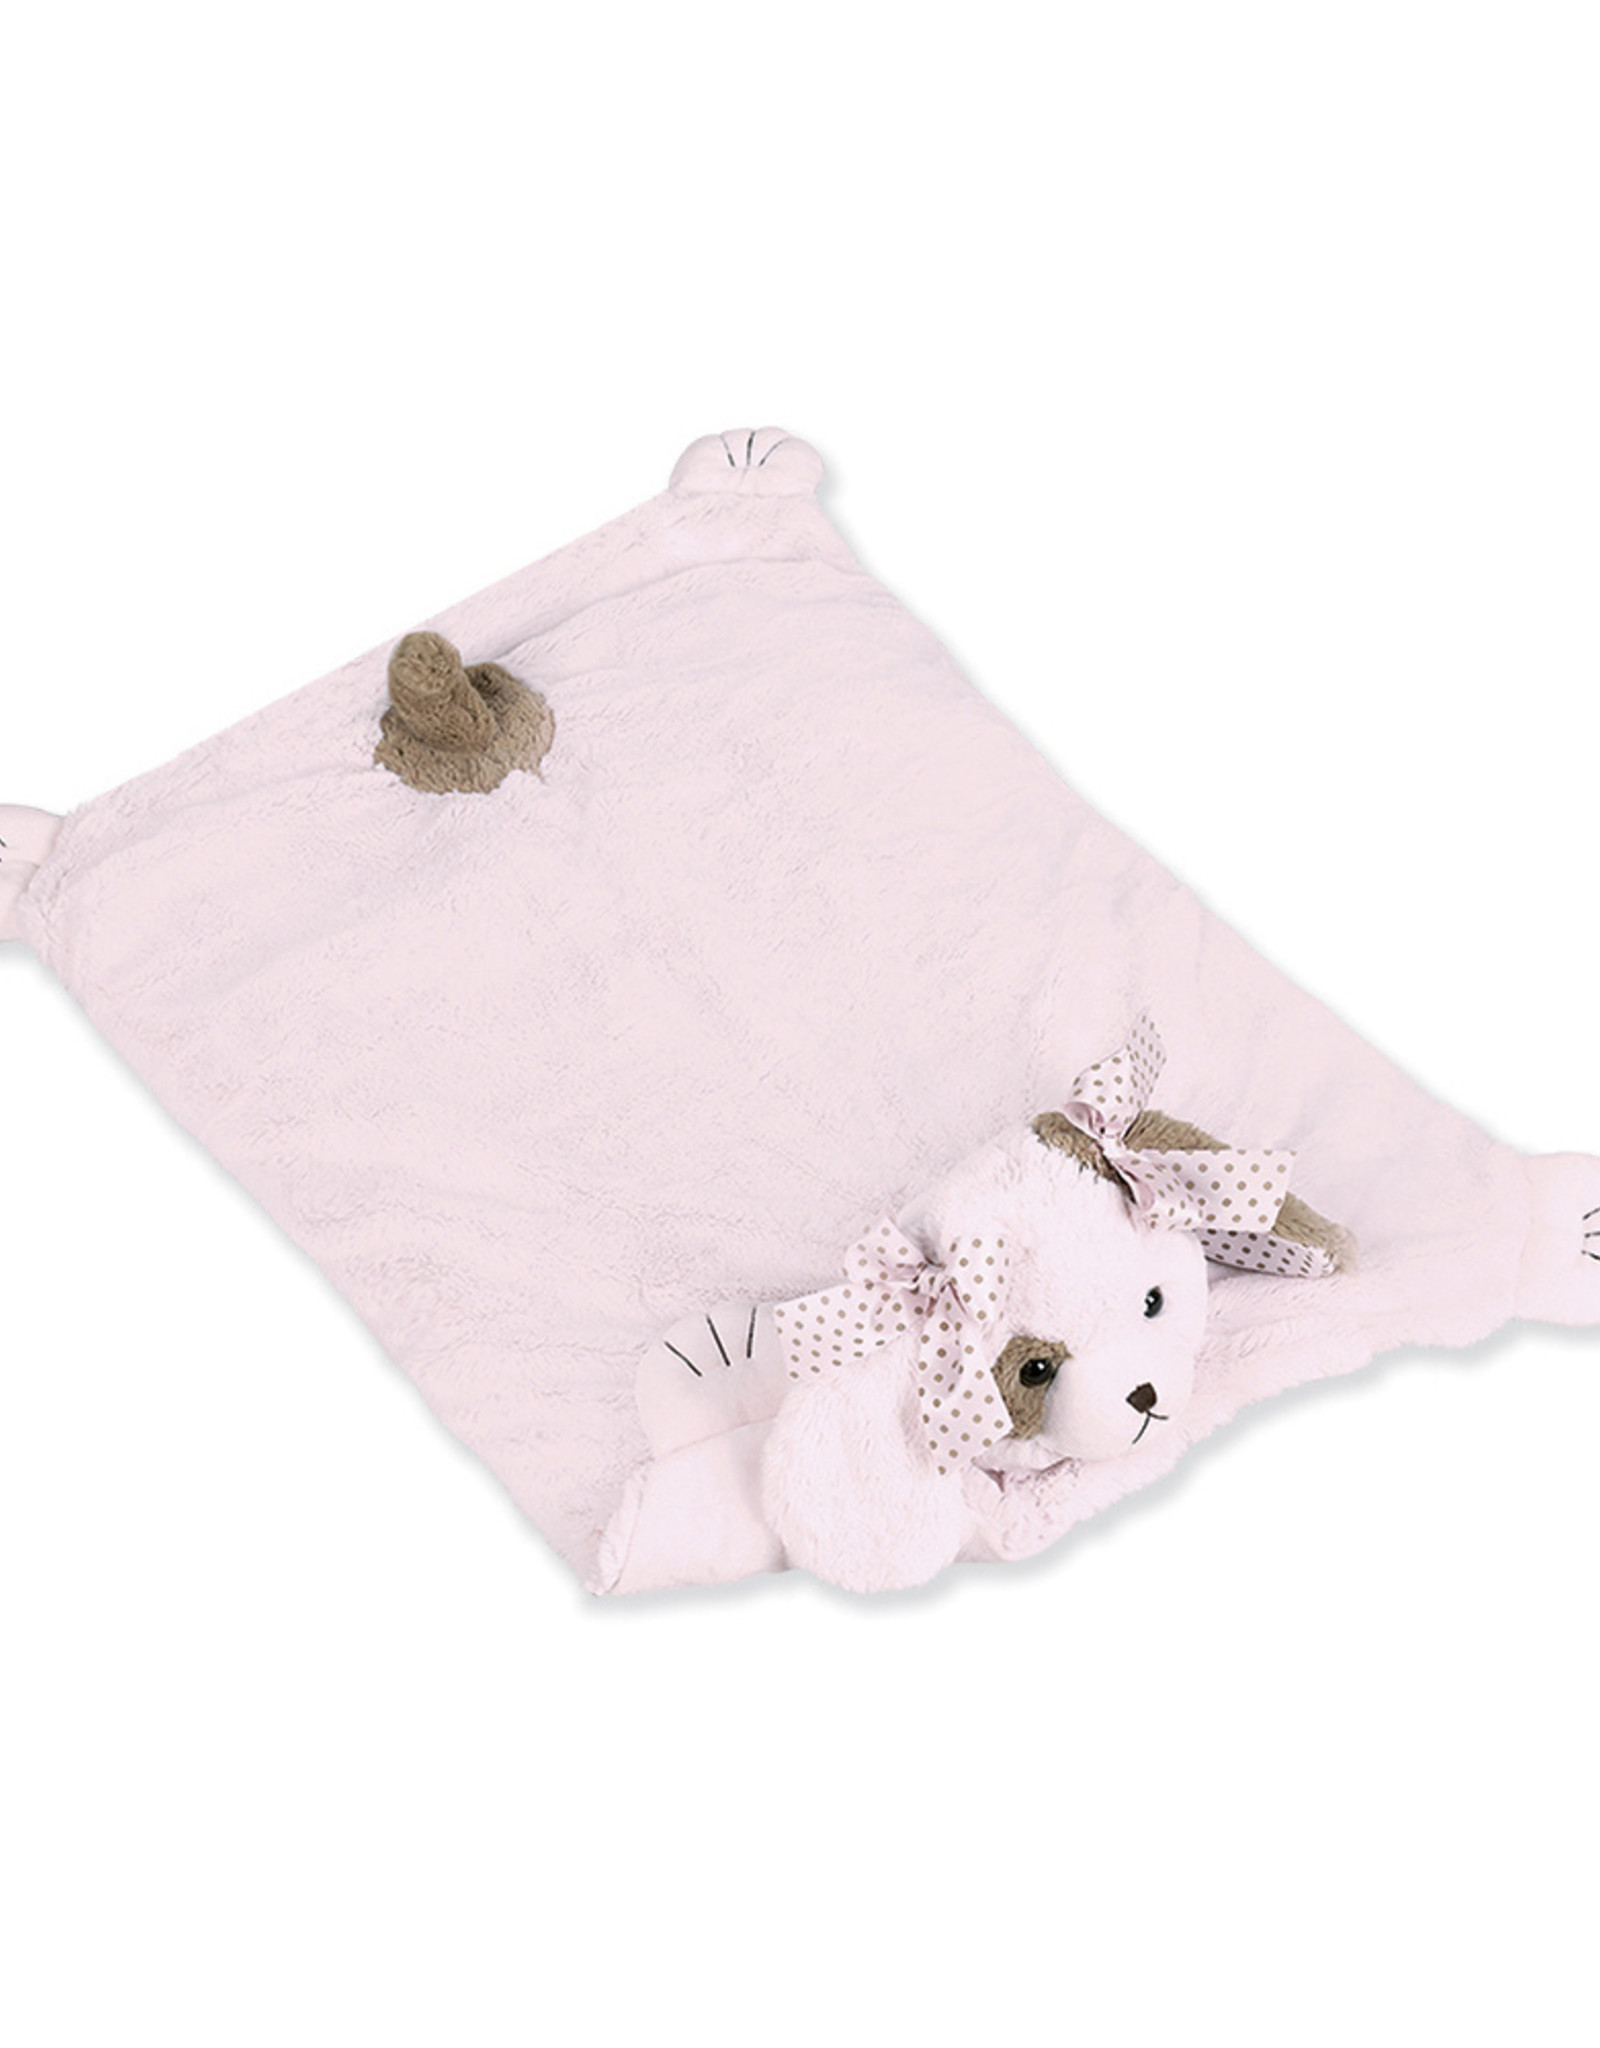 Bearington Bearington Wiggles Belly Blanket